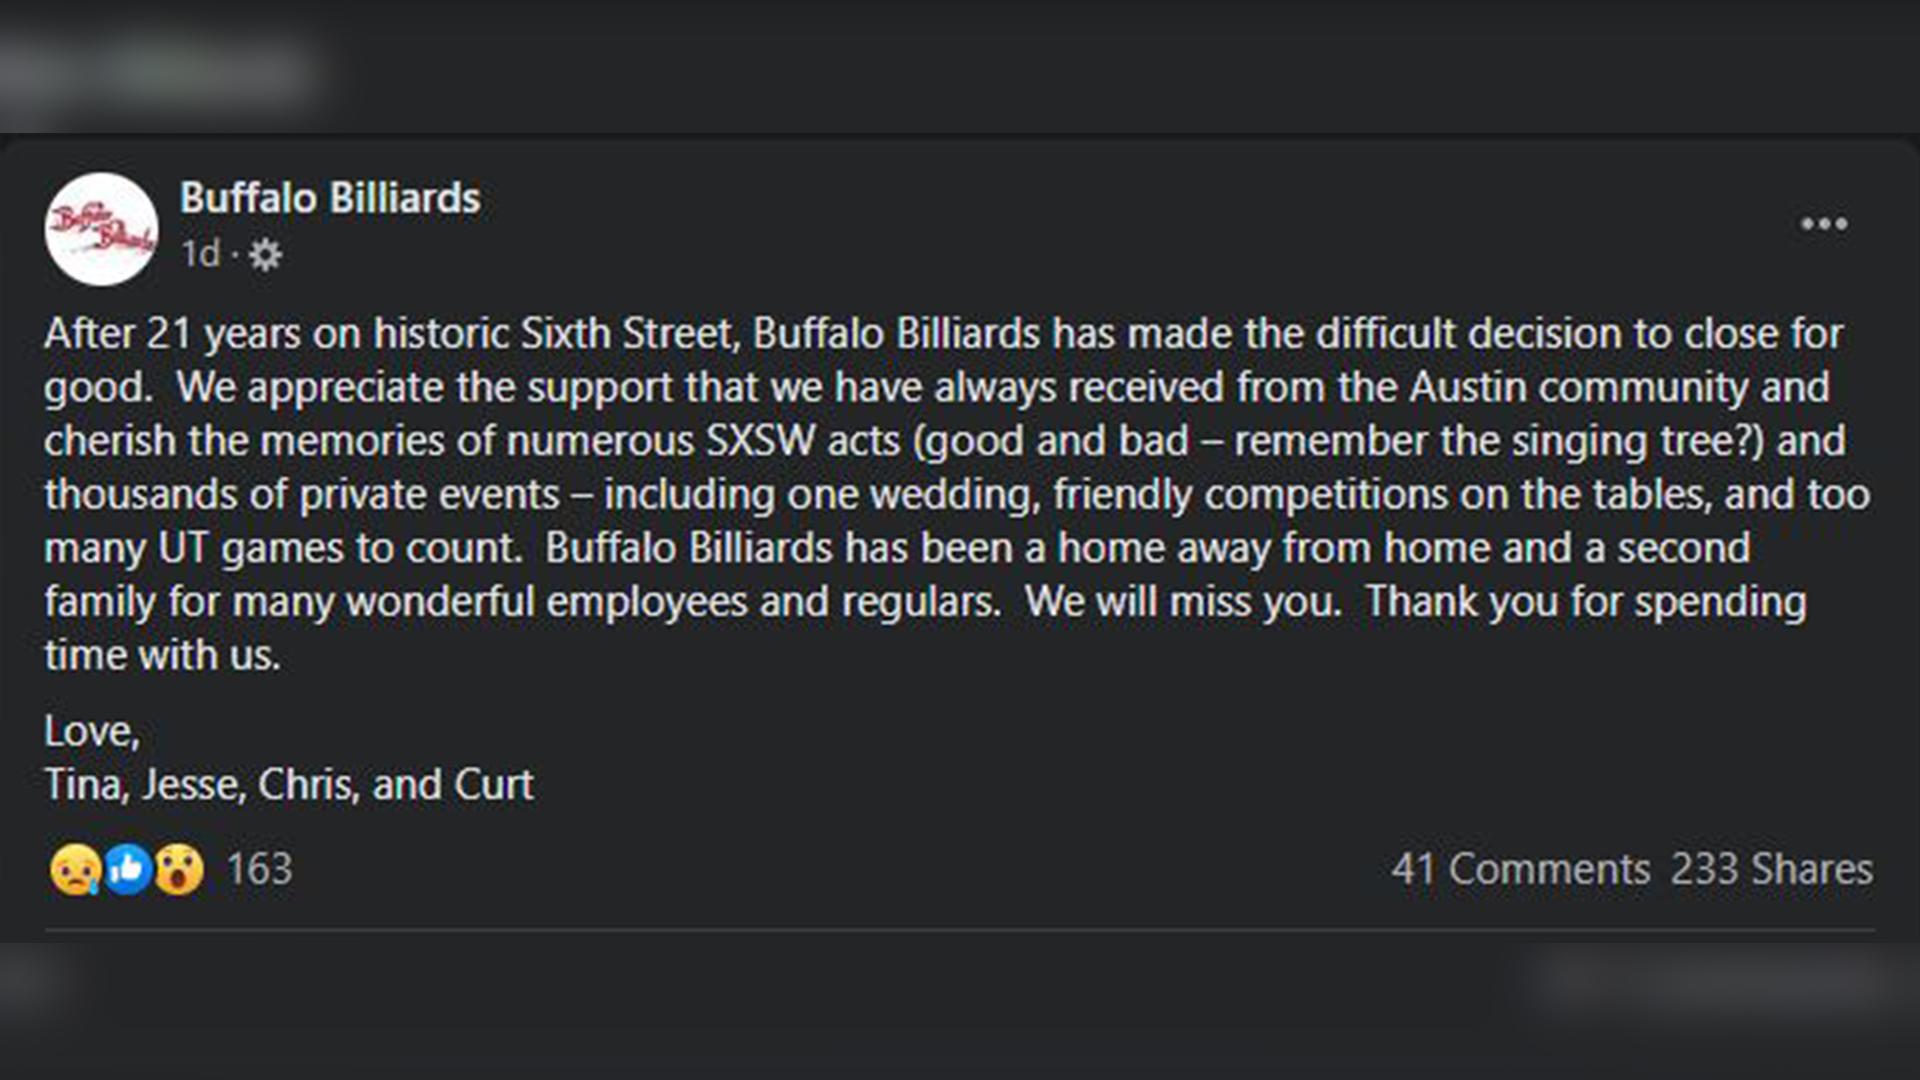 buffalo billiards closing